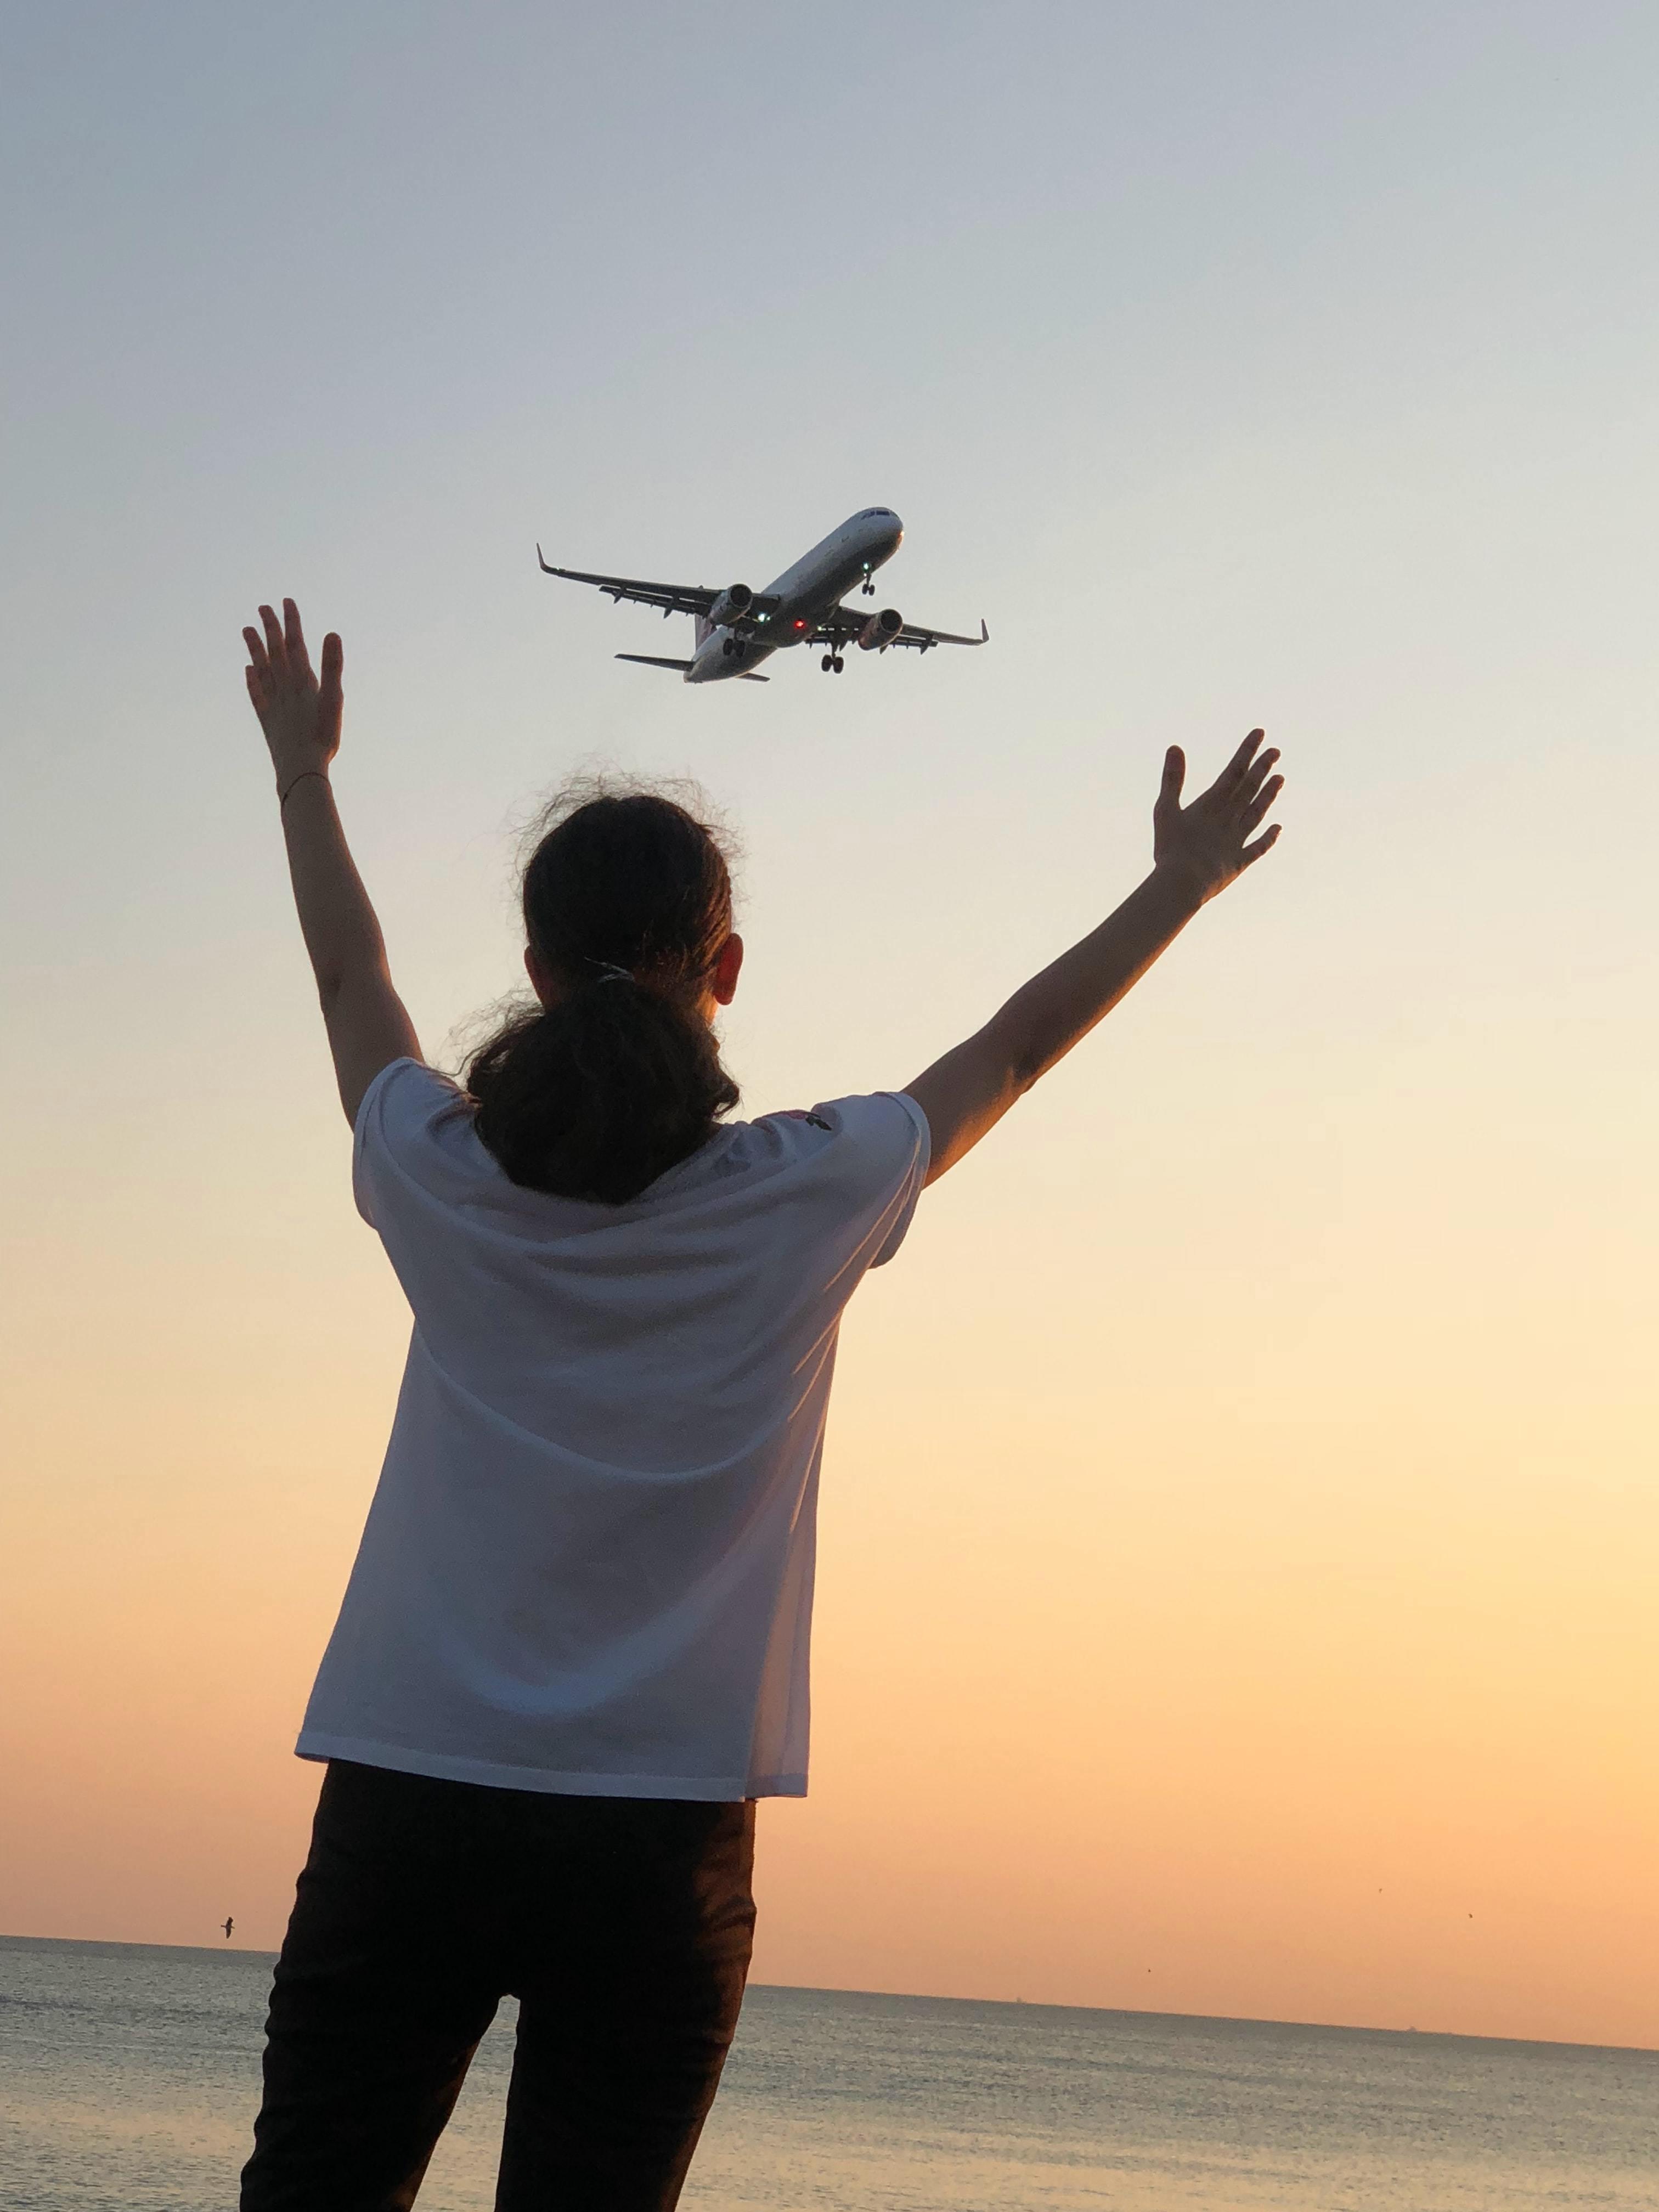 sustainable aviation fuel SAF blending mandate ReFuel EU Aviation European Union airline executives clean energy